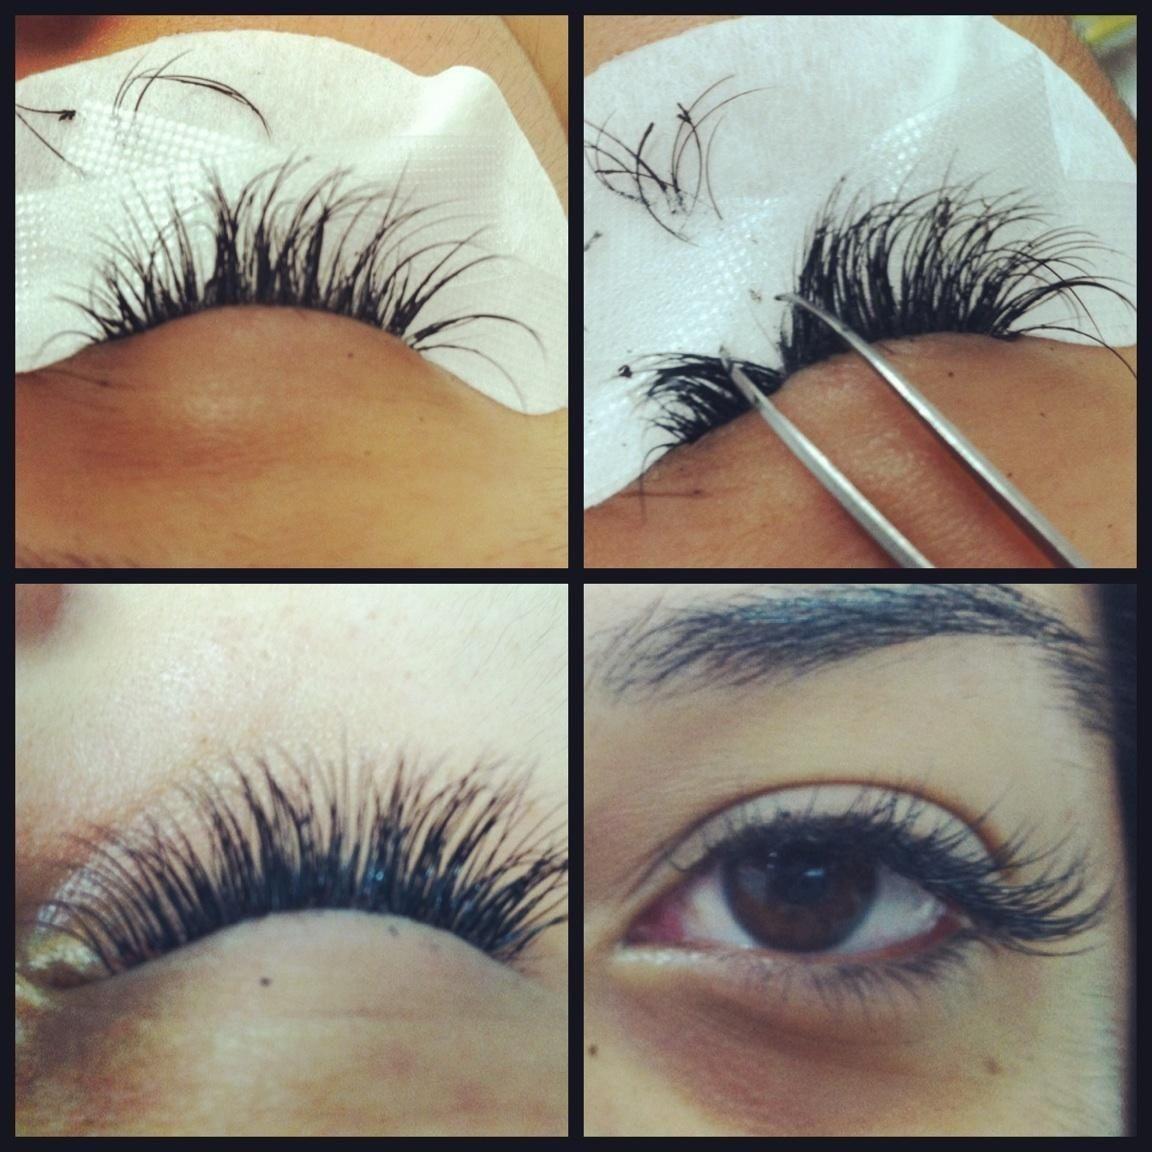 eyelash extensions types - Google Search   Eyelash ...